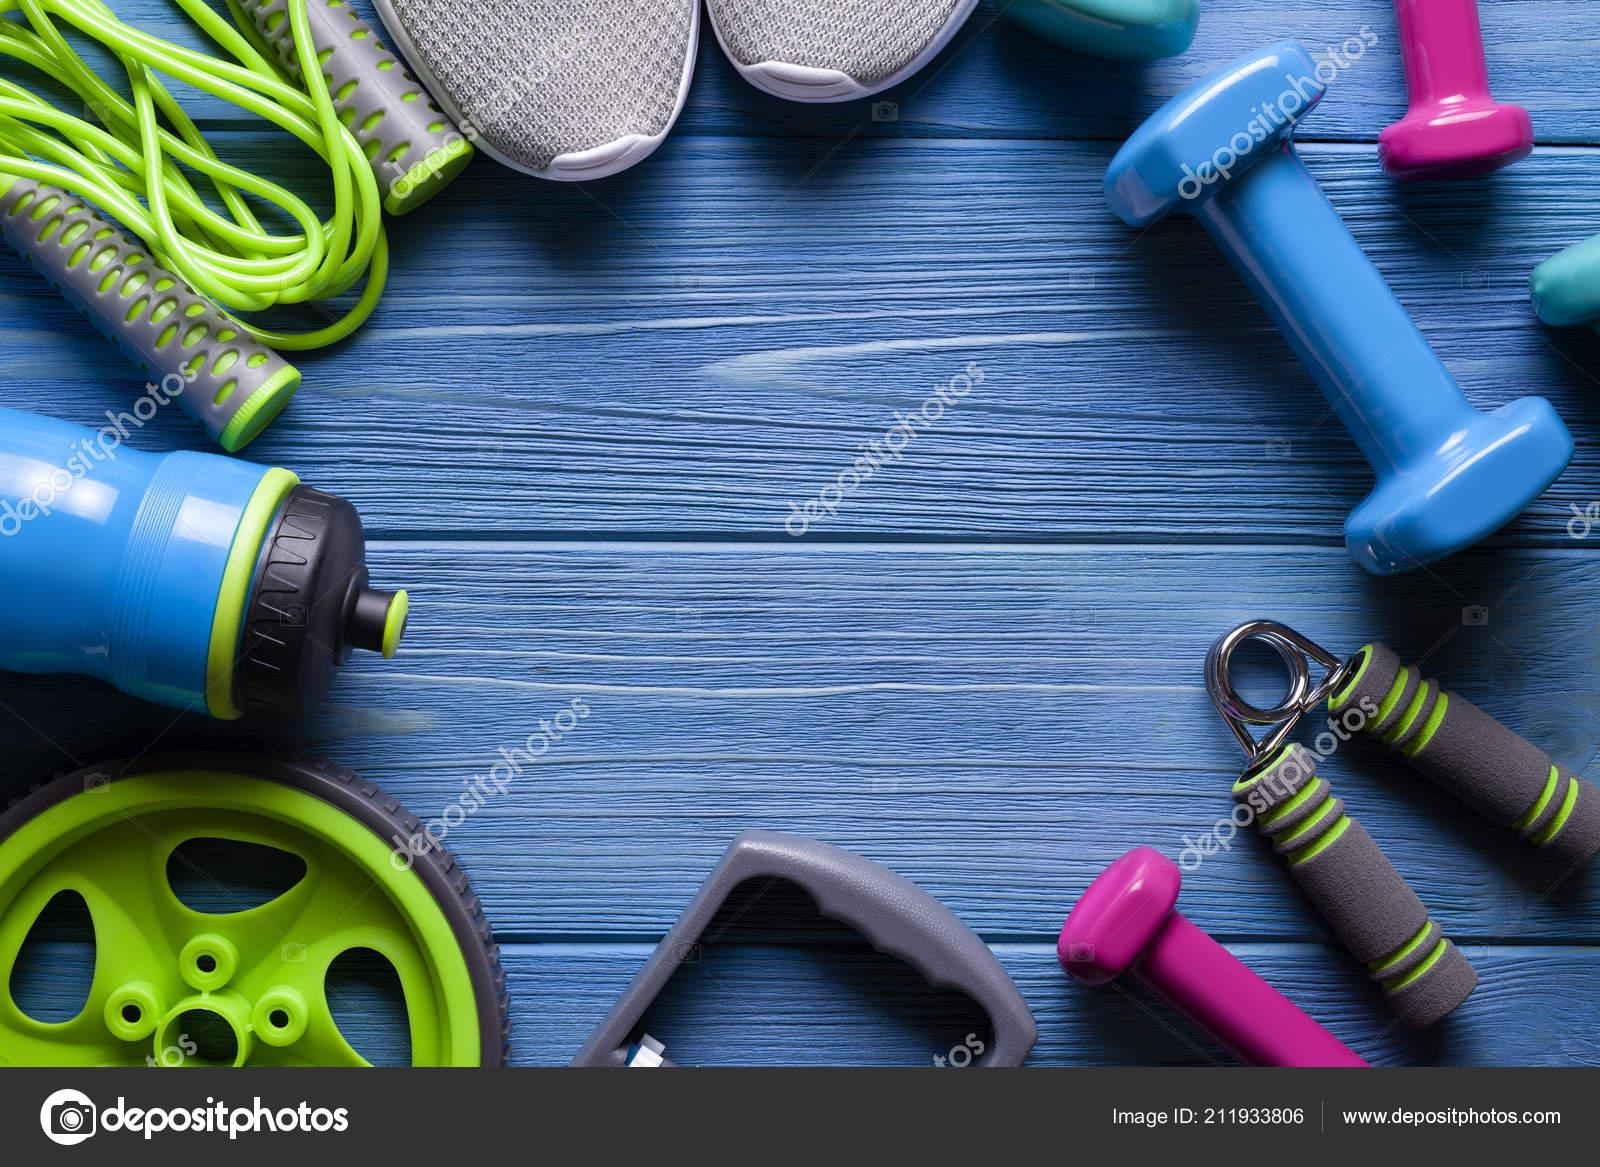 51a480ee707 Όργανα Γυμναστικής Αθλητικά Παπούτσια Άλμα Σχοινί Μπουκάλι Νερό Και Αλτήρα  — Φωτογραφία Αρχείου